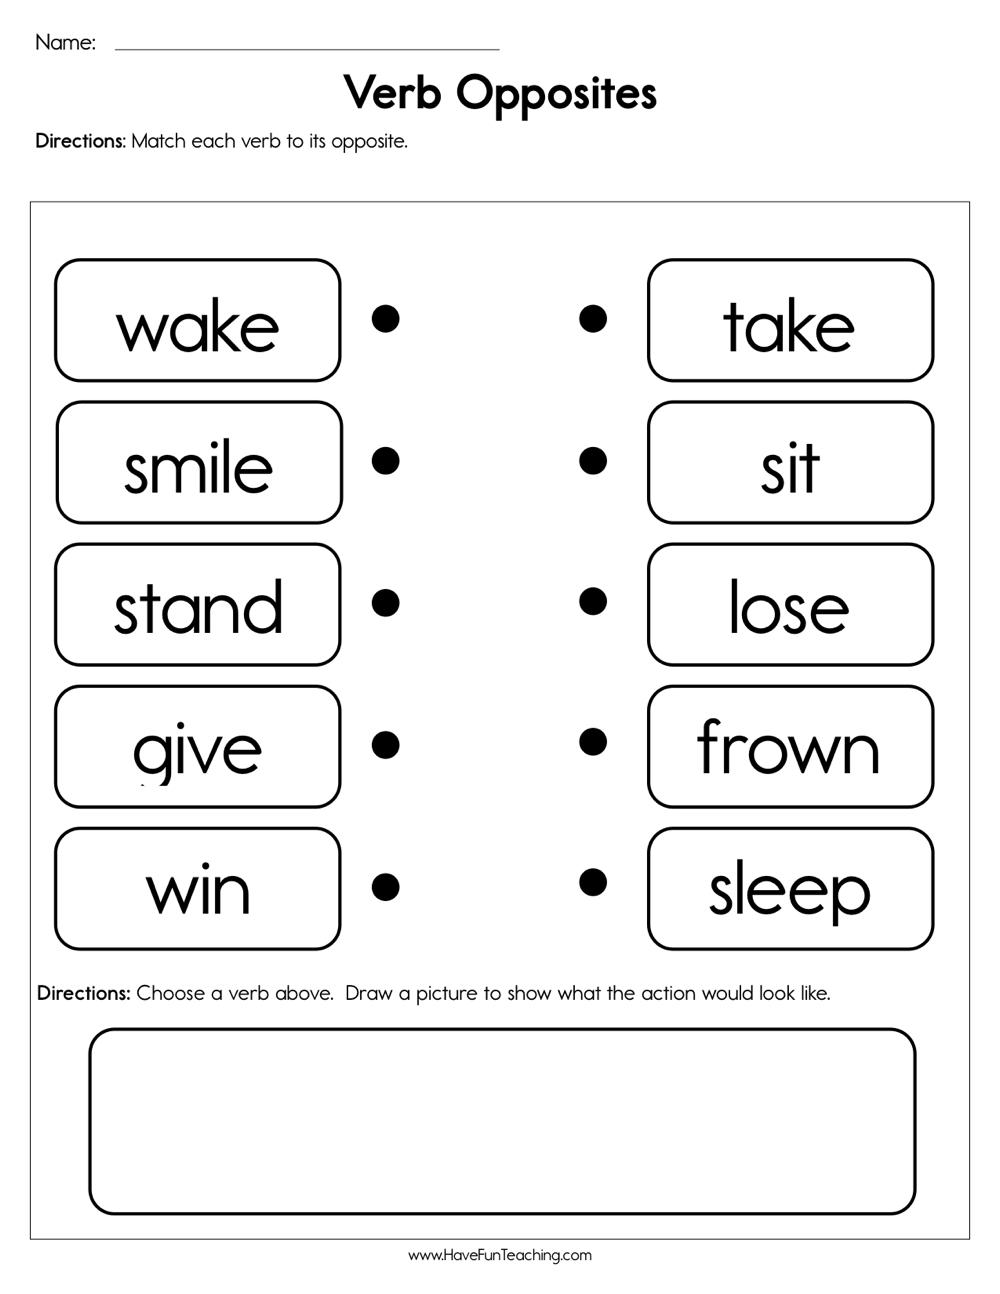 medium resolution of Verb Opposites Worksheet • Have Fun Teaching